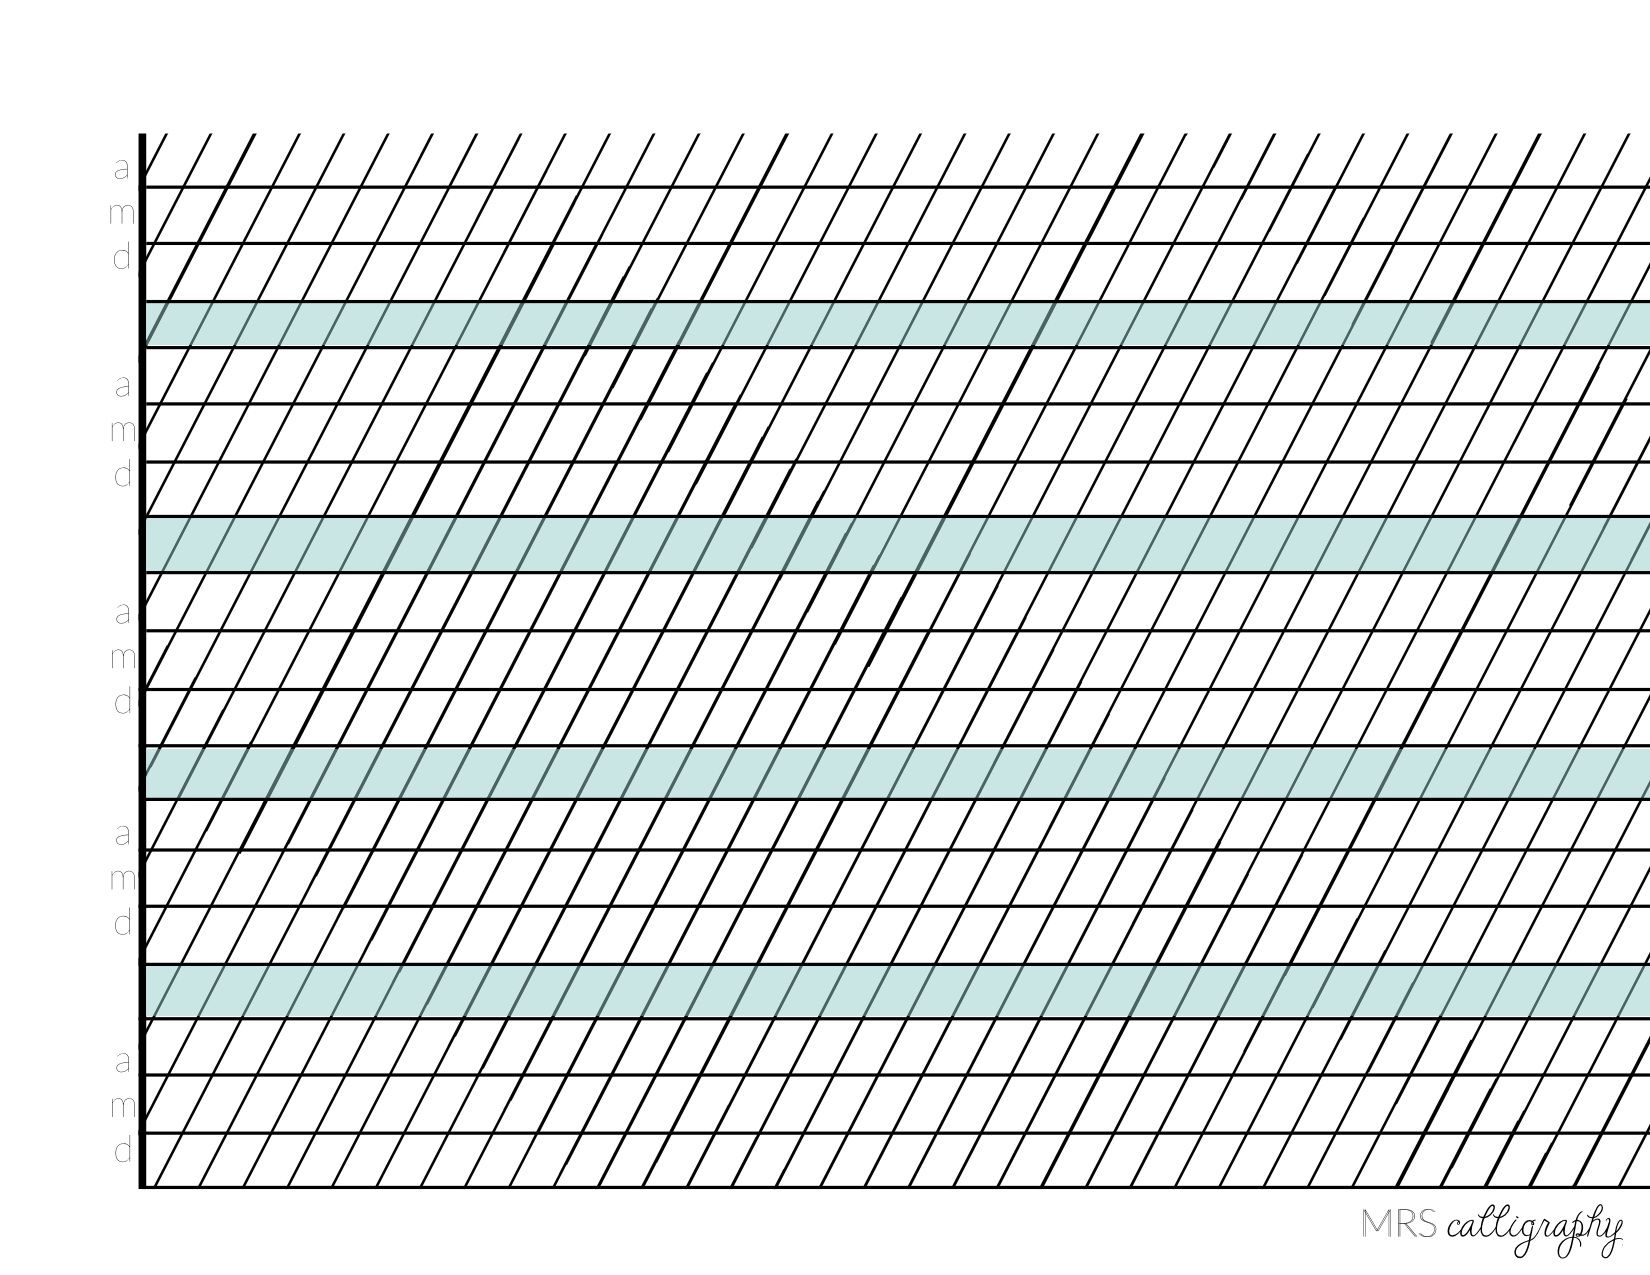 Calligraphy Grid